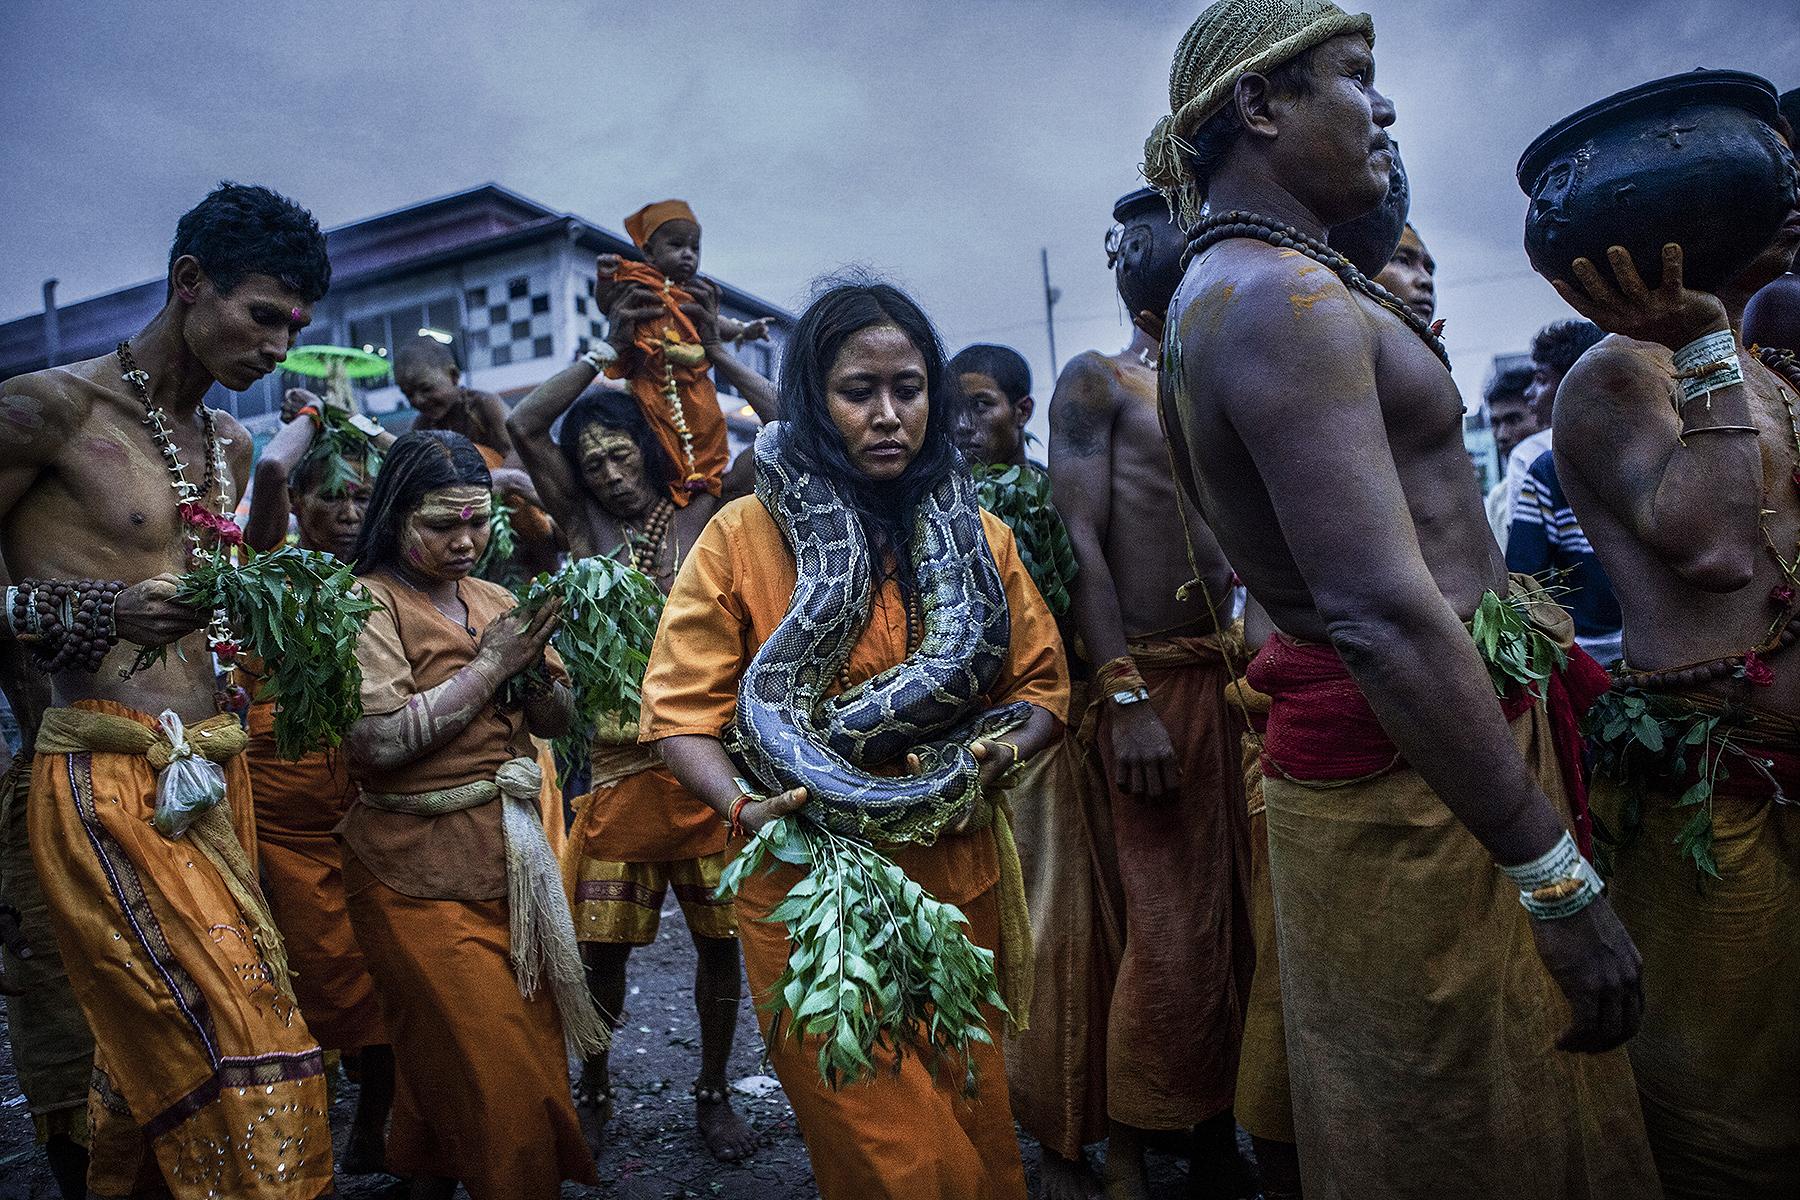 burmese_tamils_0003